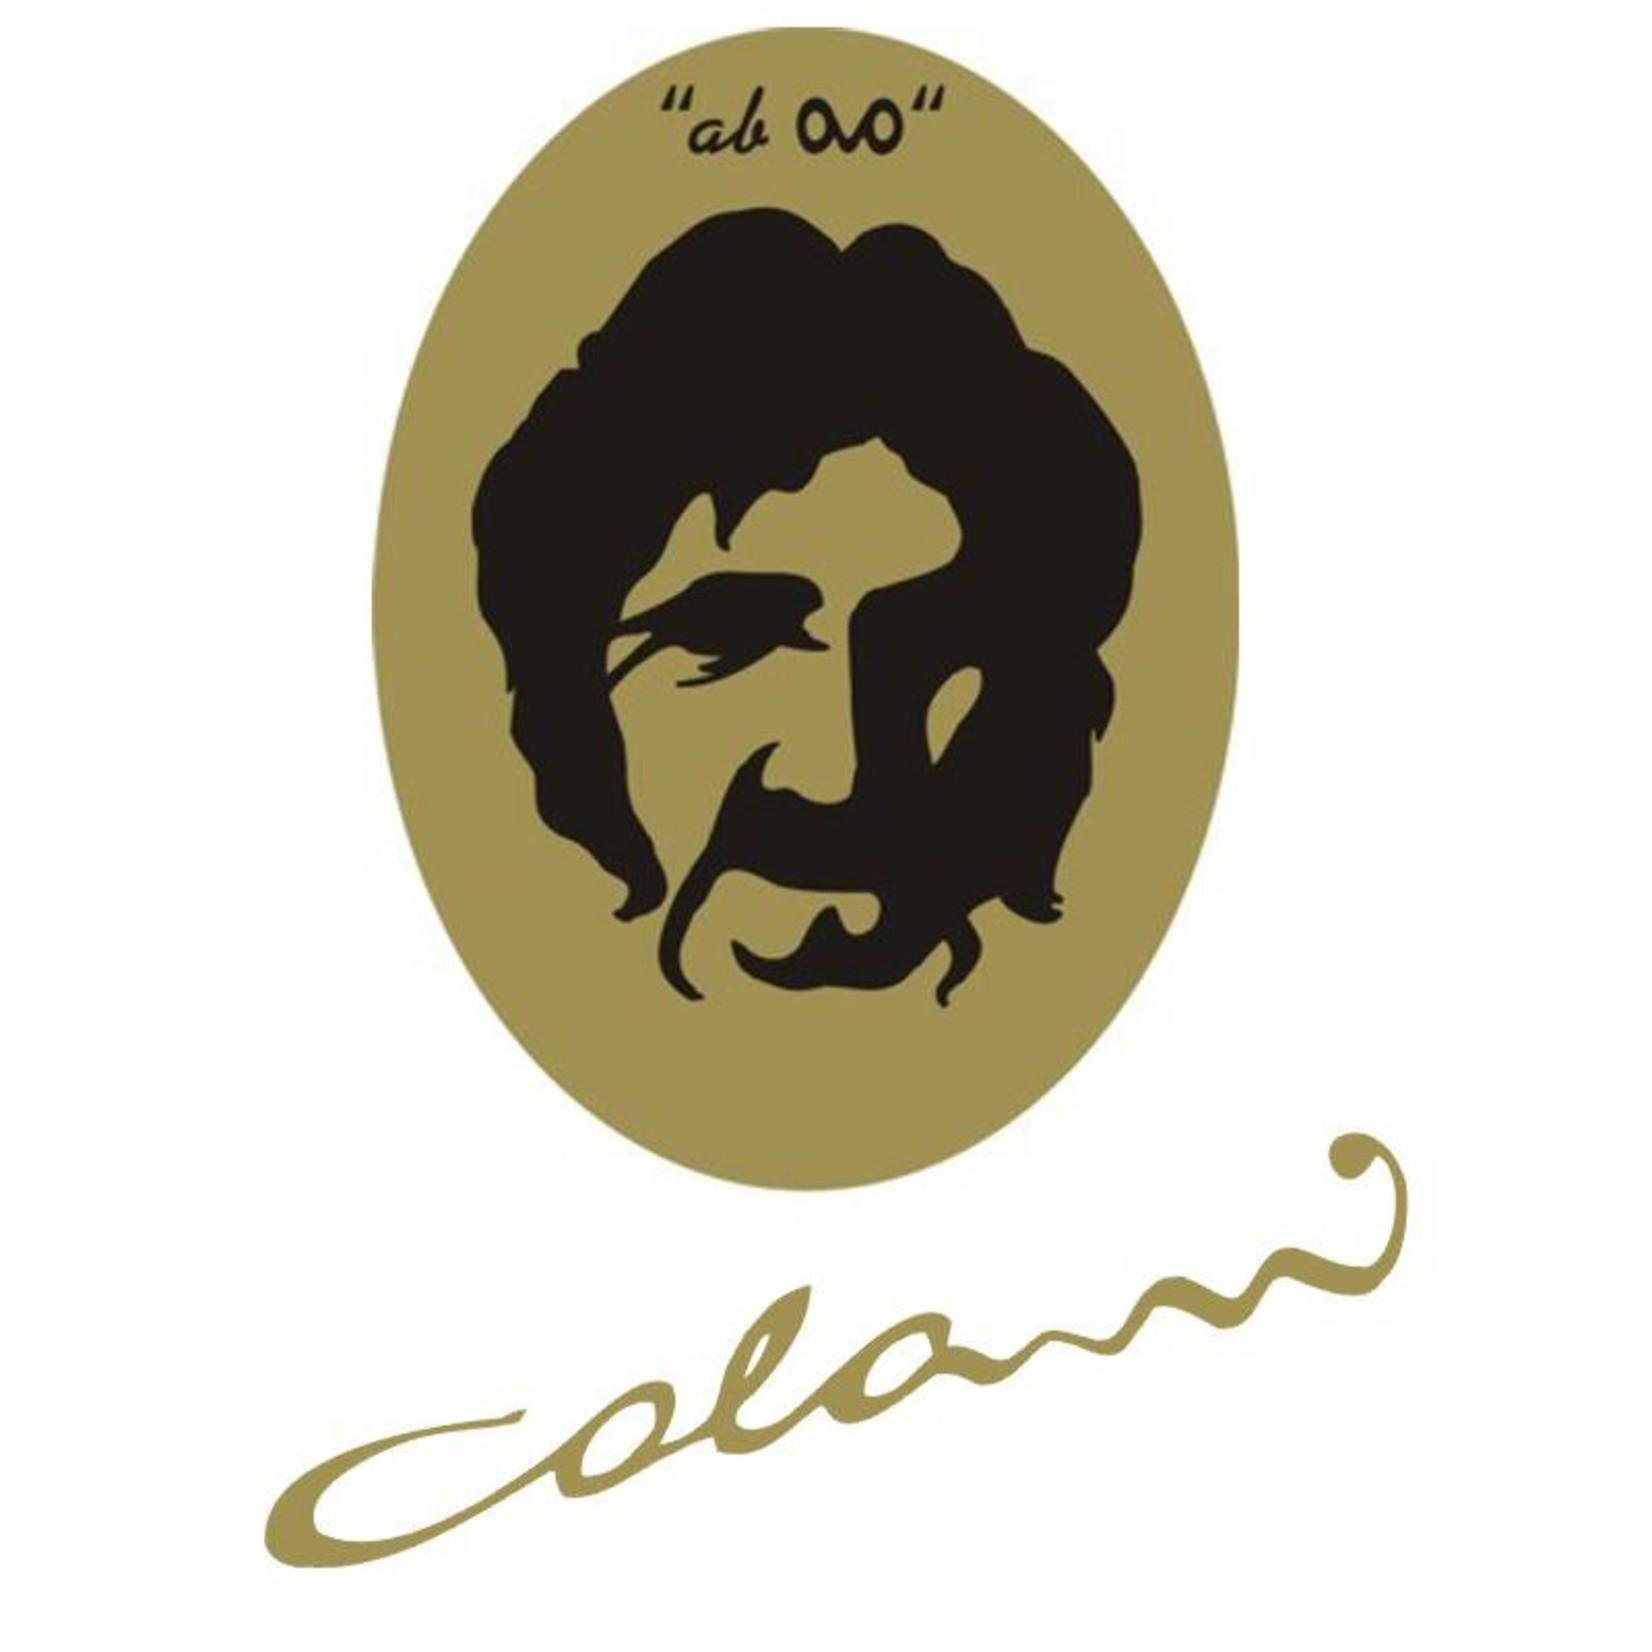 Colani Porzellanserie Colani Eierbecher | schwarz | Porzellan | Luigi Colani Design